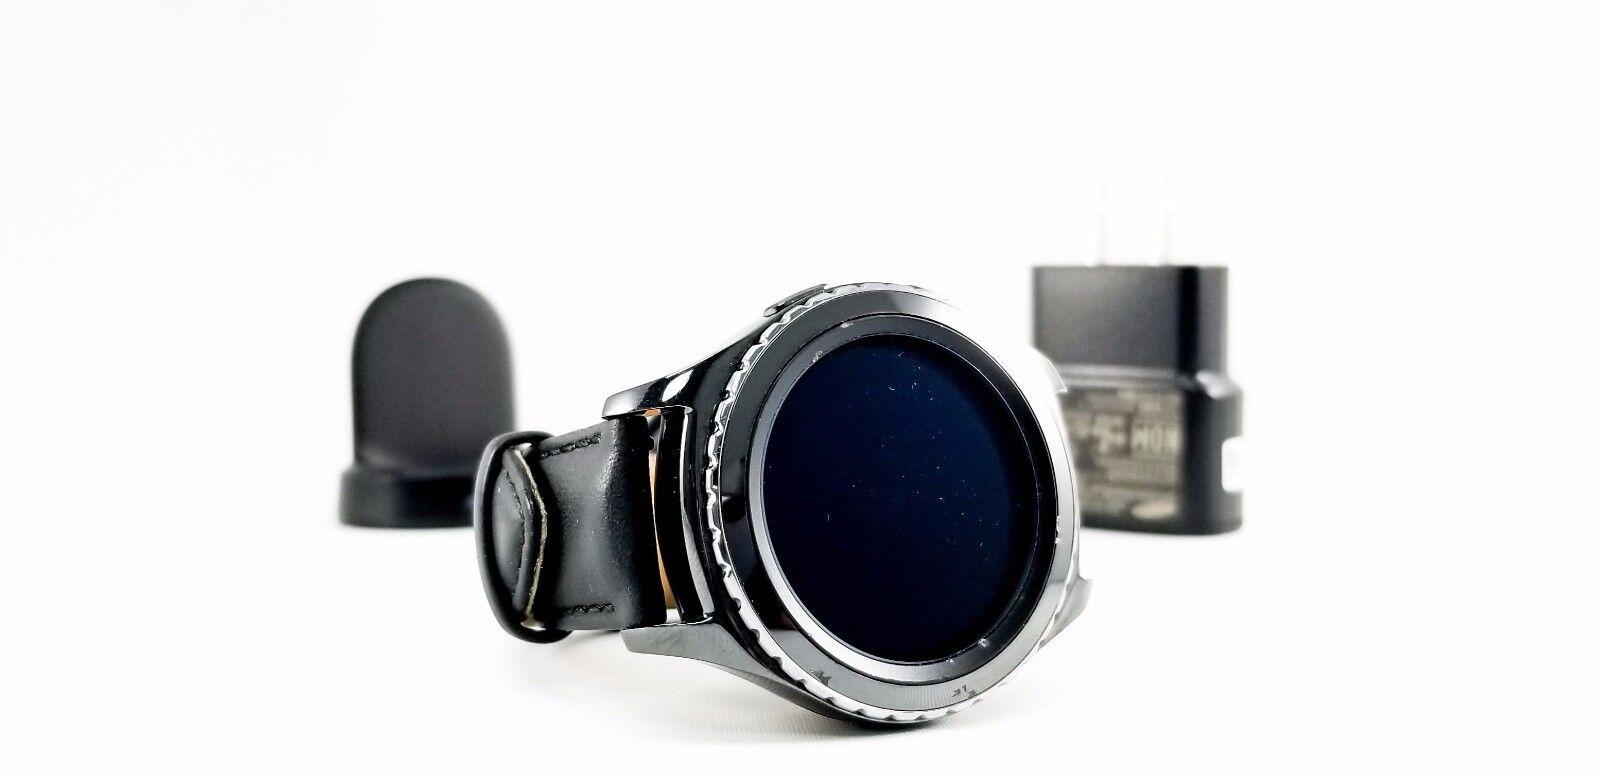 $105.99 - SAMSUNG GALAXY GEAR S2 CLASSIC BLACK SM-R735A SMARTWATCH AT&T Unlocked GSM